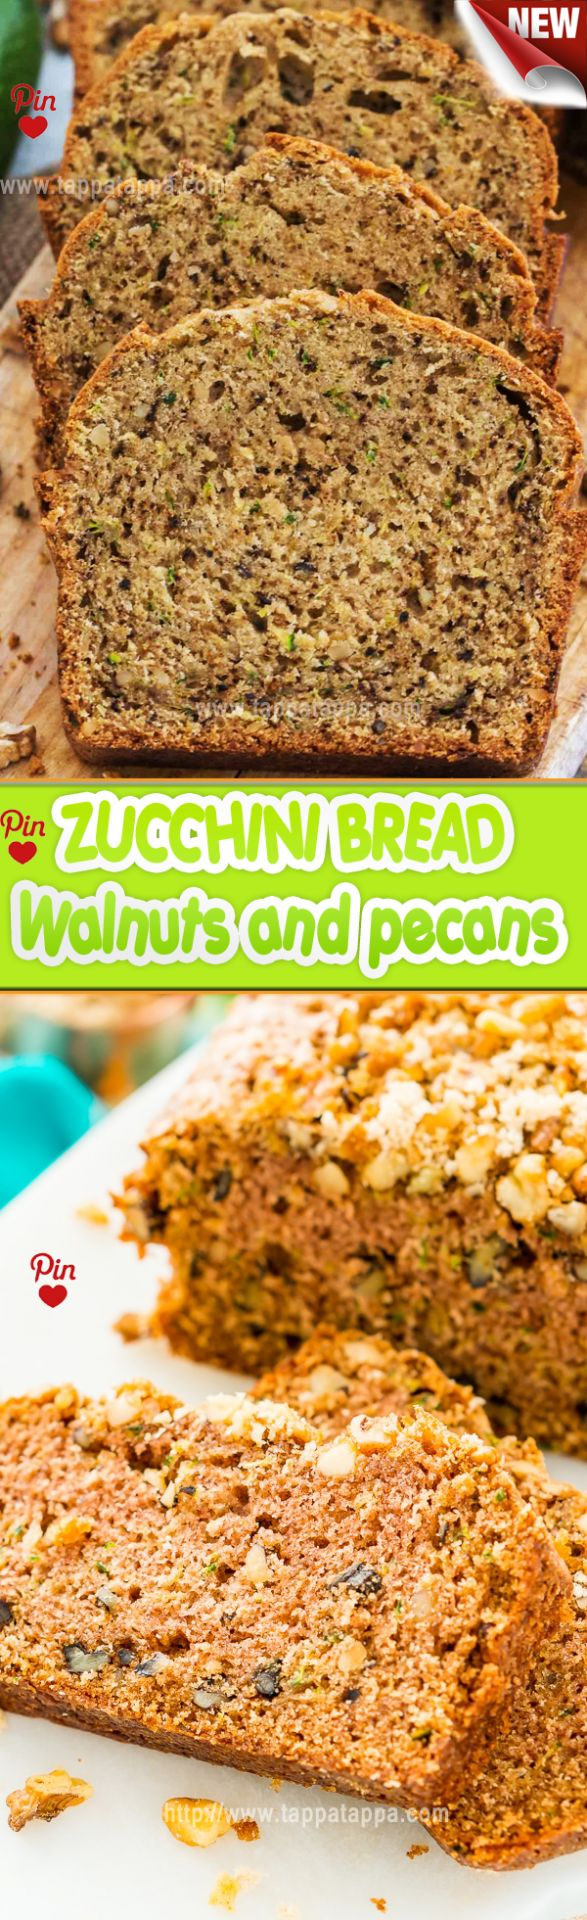 EPIC #ZUCCHINI BREAD Walnuts and pecans are especially good in zucchini bread an…